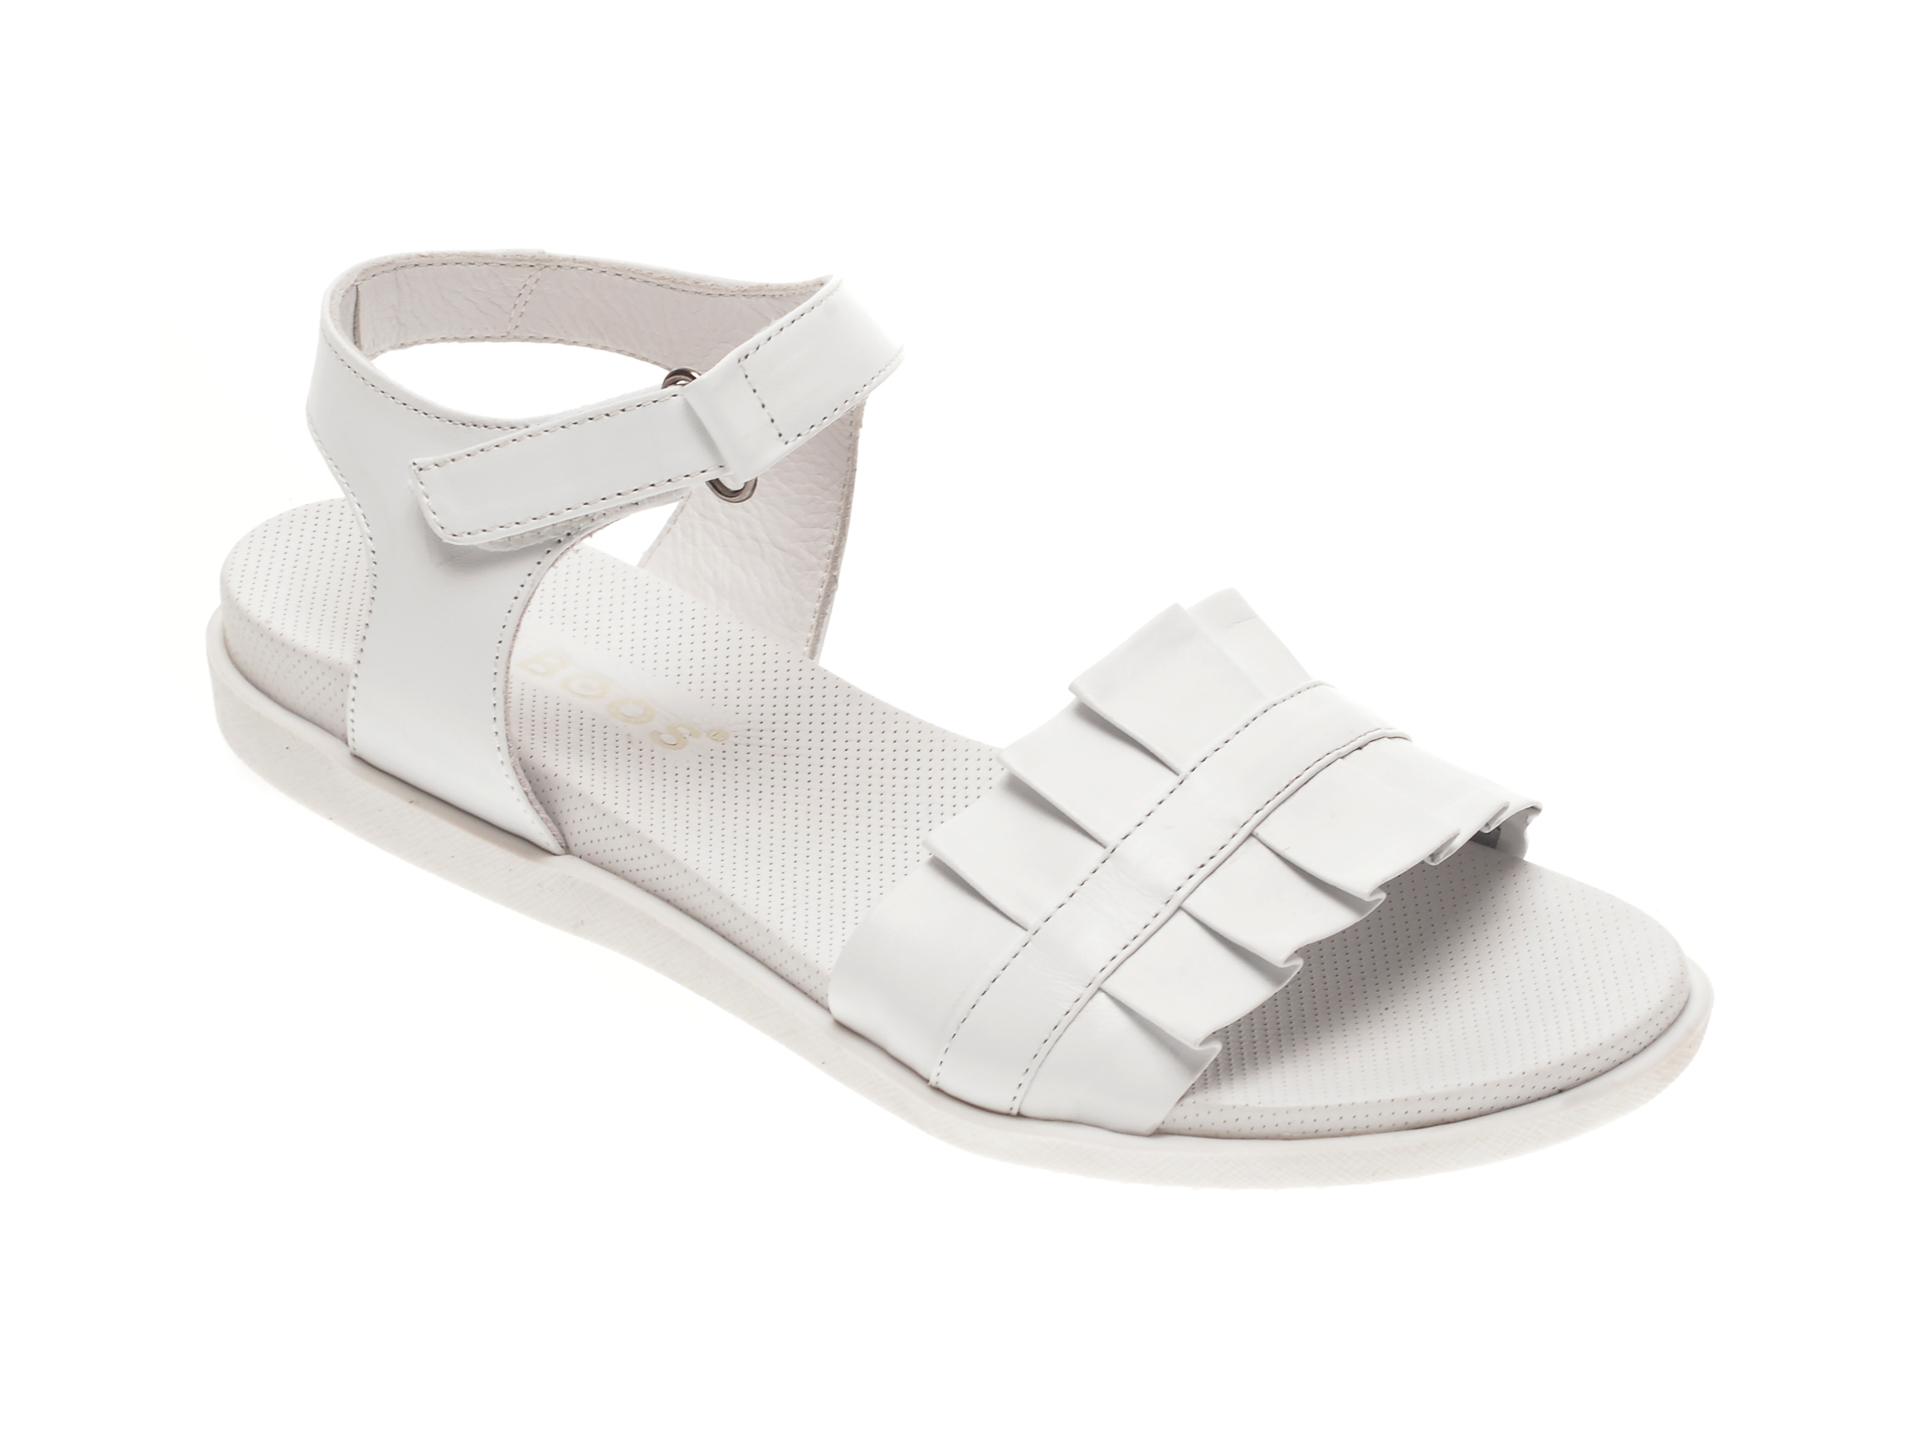 Sandale BABOOS albe, 1403, din piele naturala